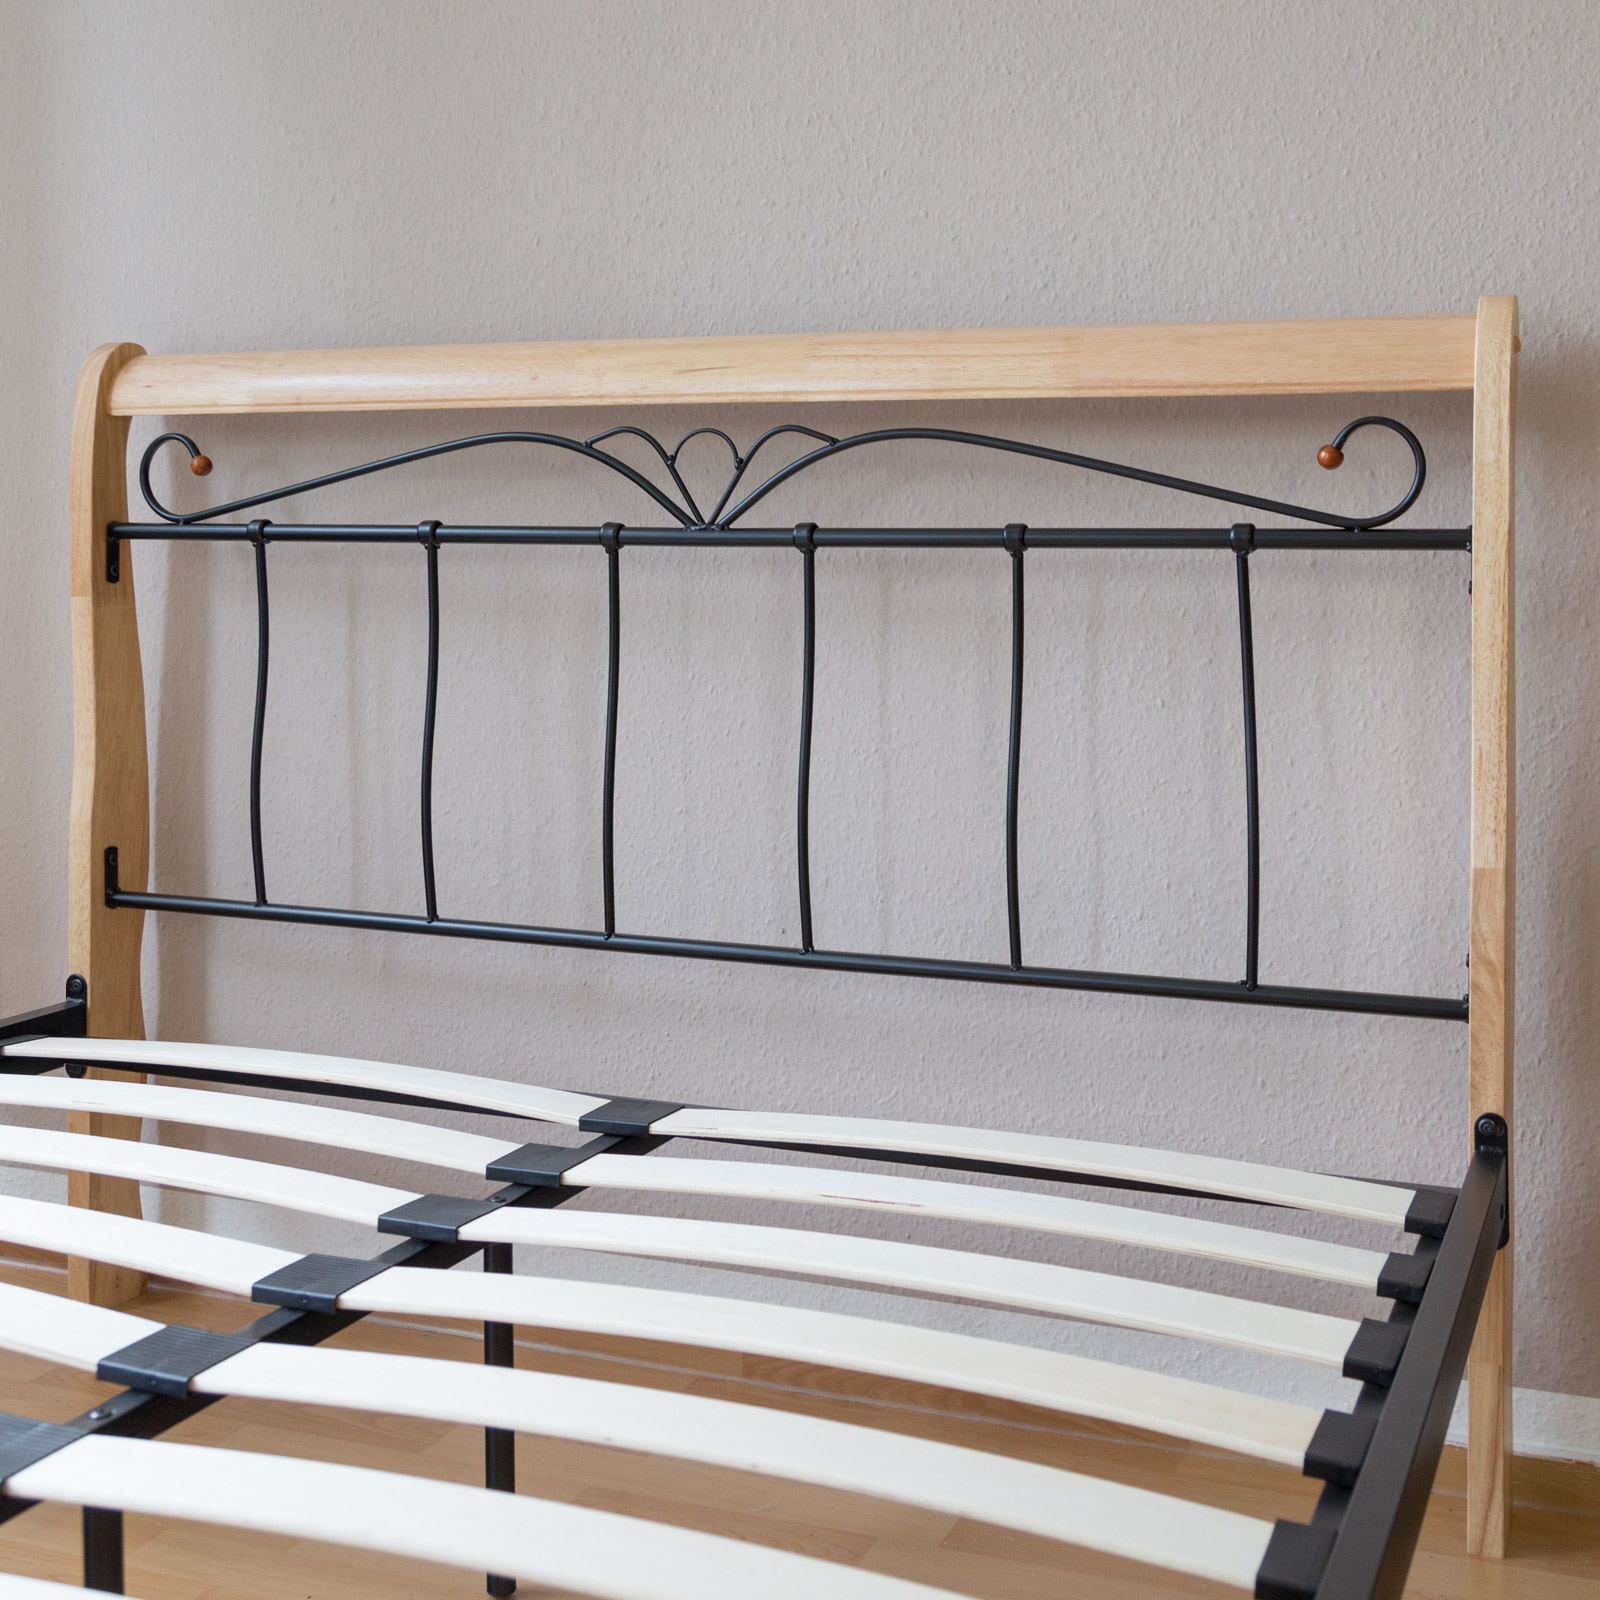 design metal lit double 160 x 200 cadre de lit lattes bois naturelle 1008 ebay. Black Bedroom Furniture Sets. Home Design Ideas